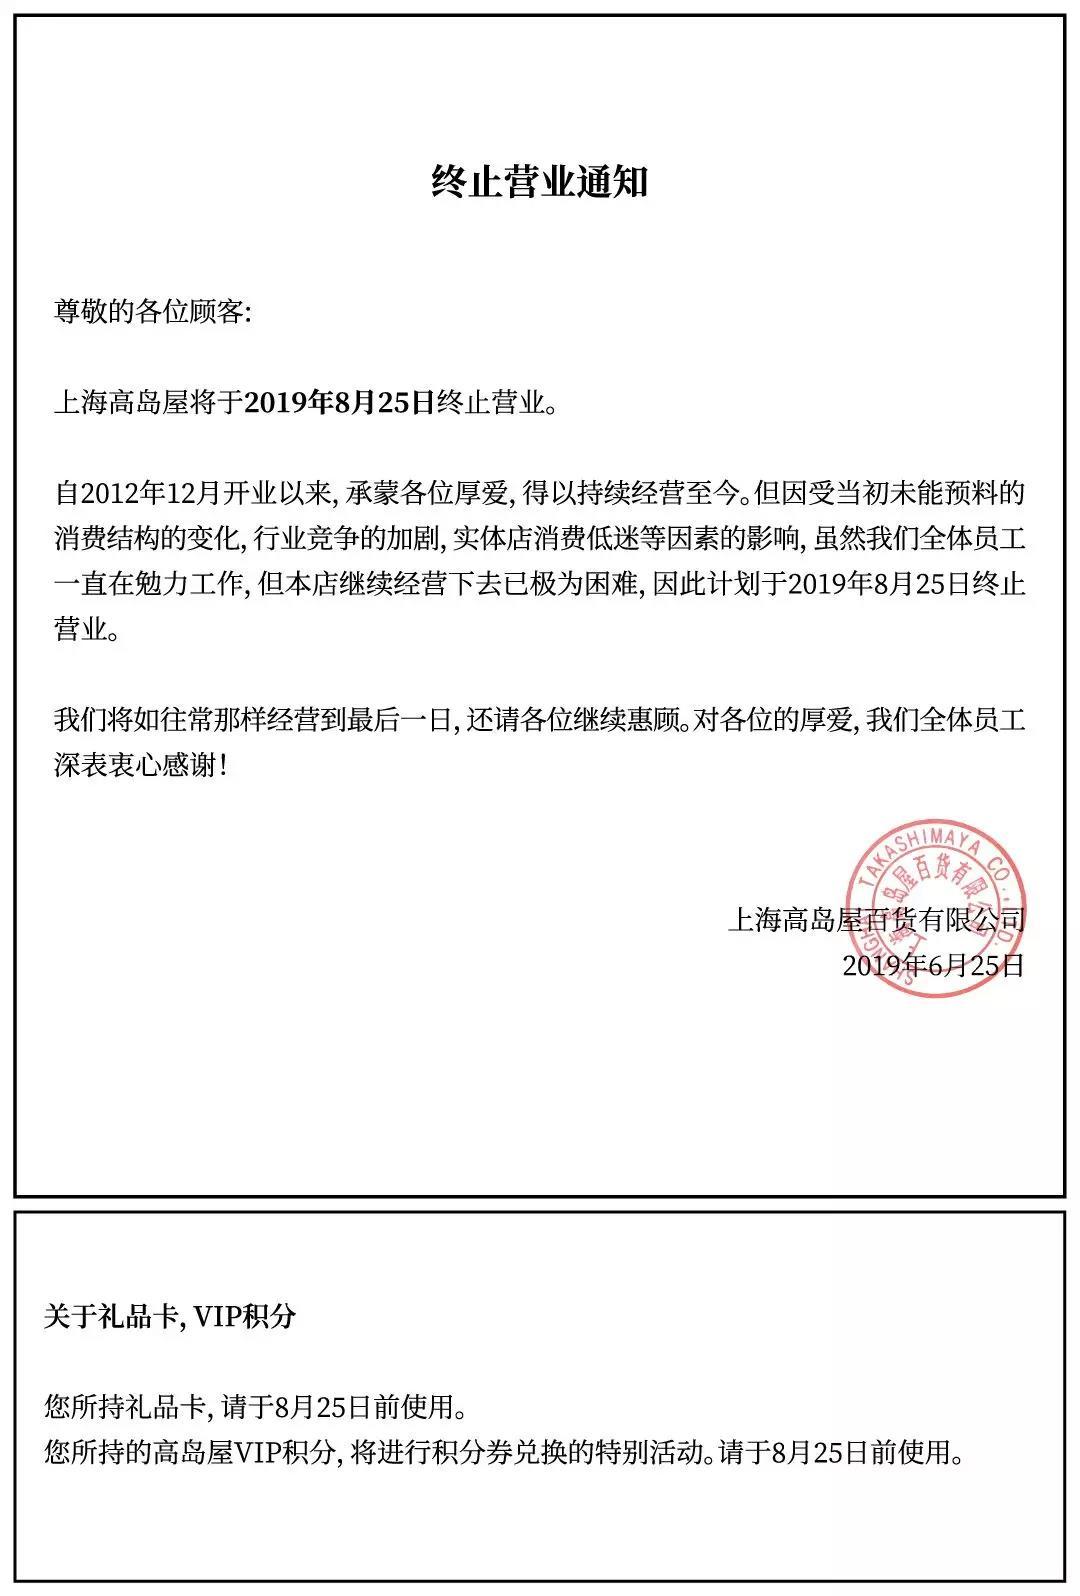 http://www.tartansash.com/riyongbaihuo/363508.html